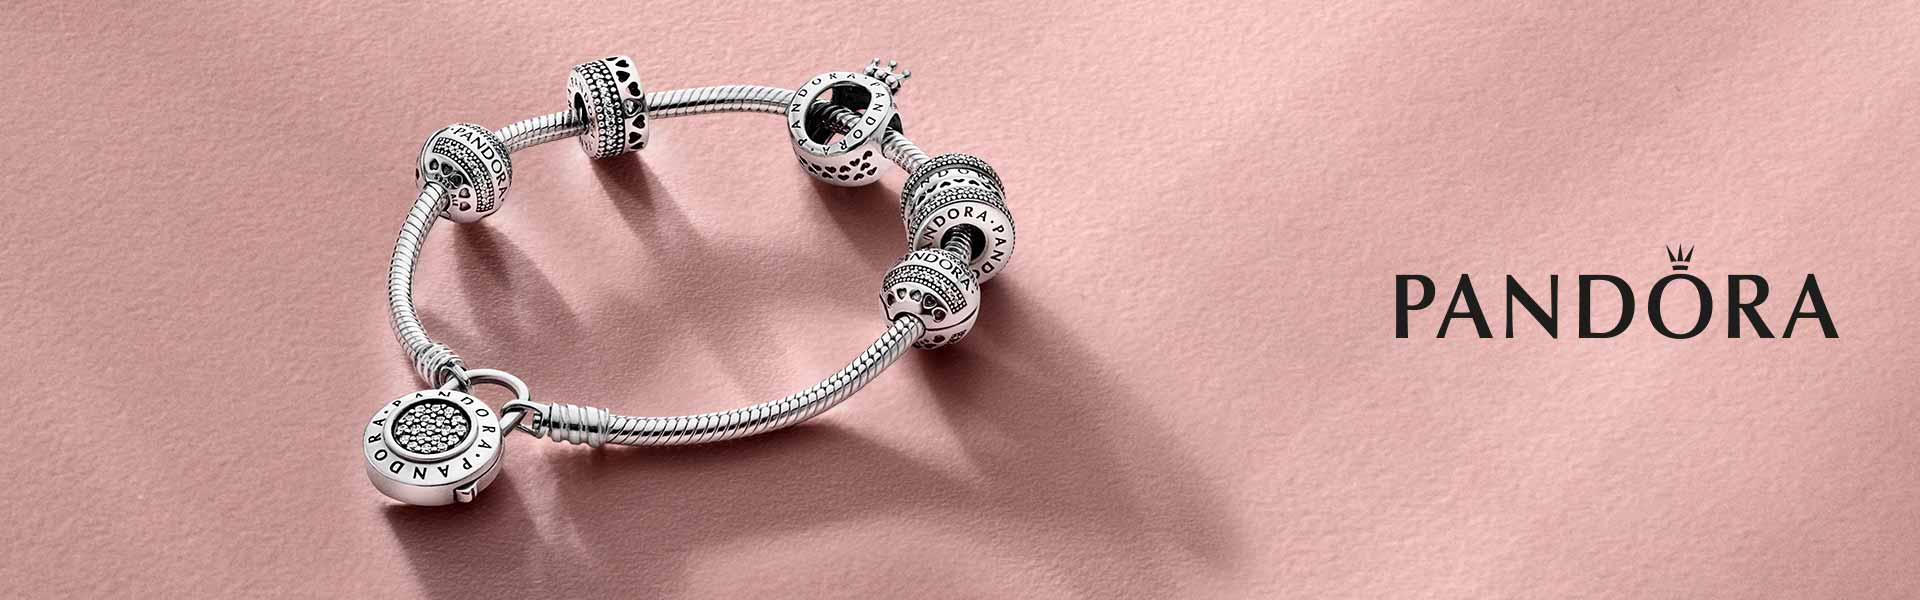 Pandora armband på jewelyrbox.se, alltid fri frakt